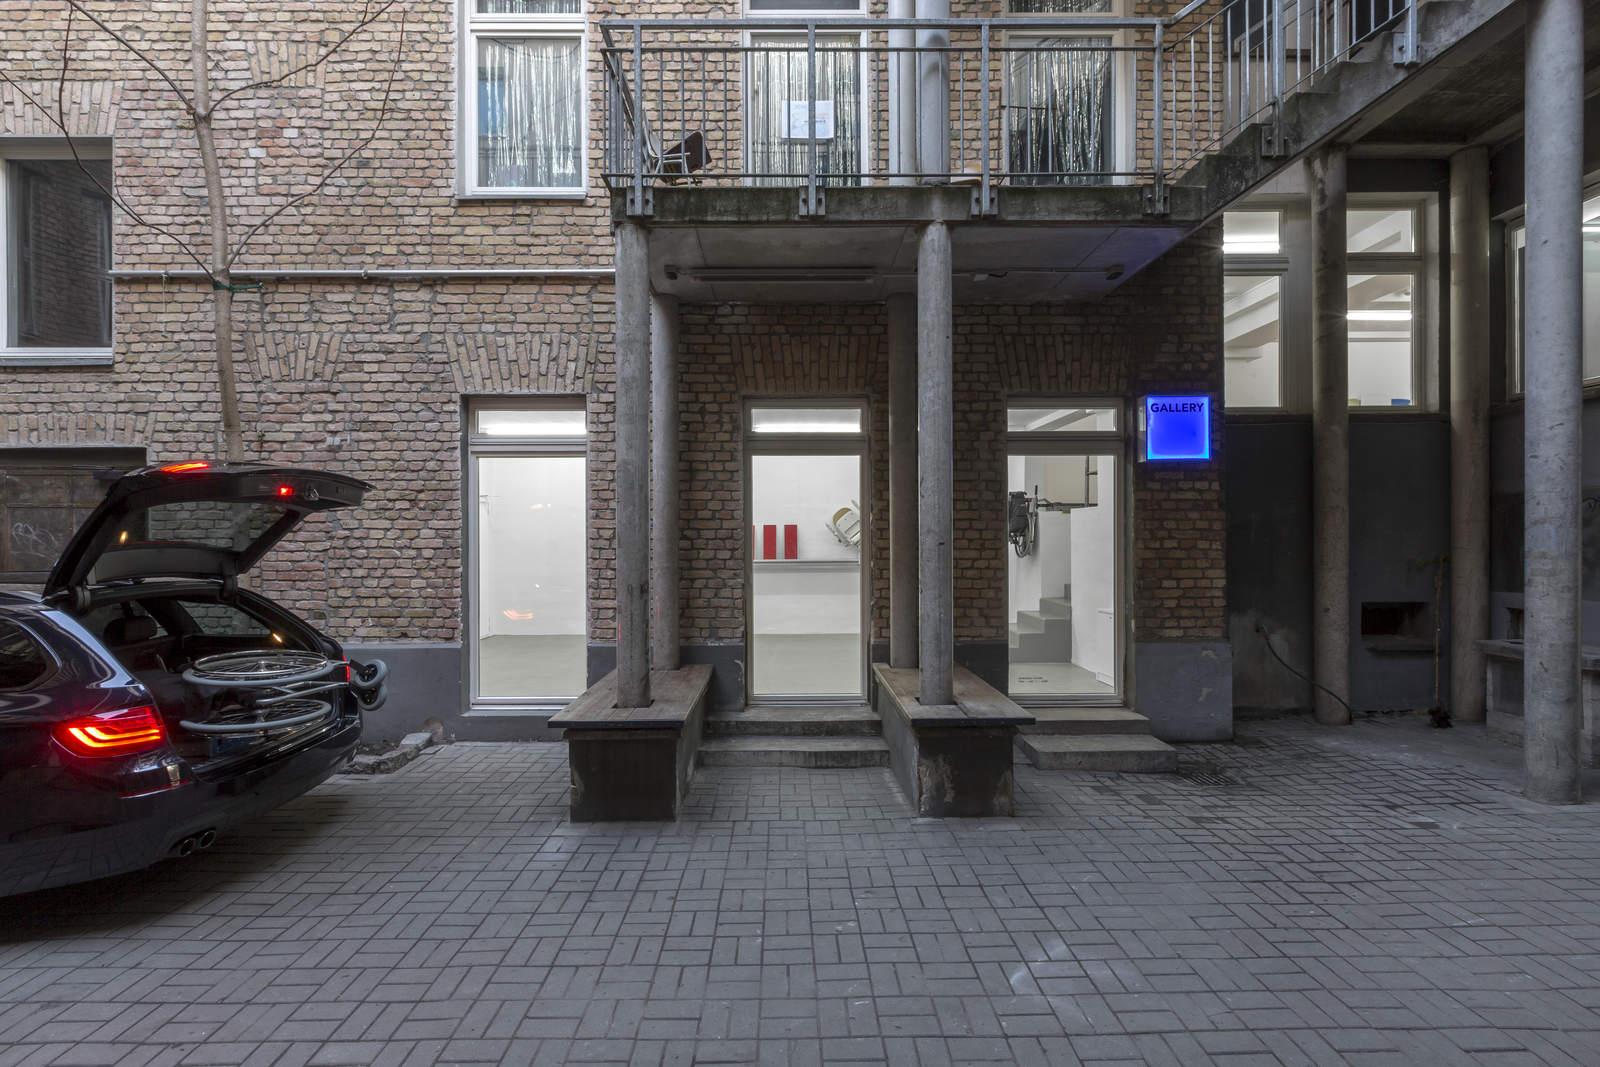 Matthias_Sohr_ACUD_gallery_01_installation_view